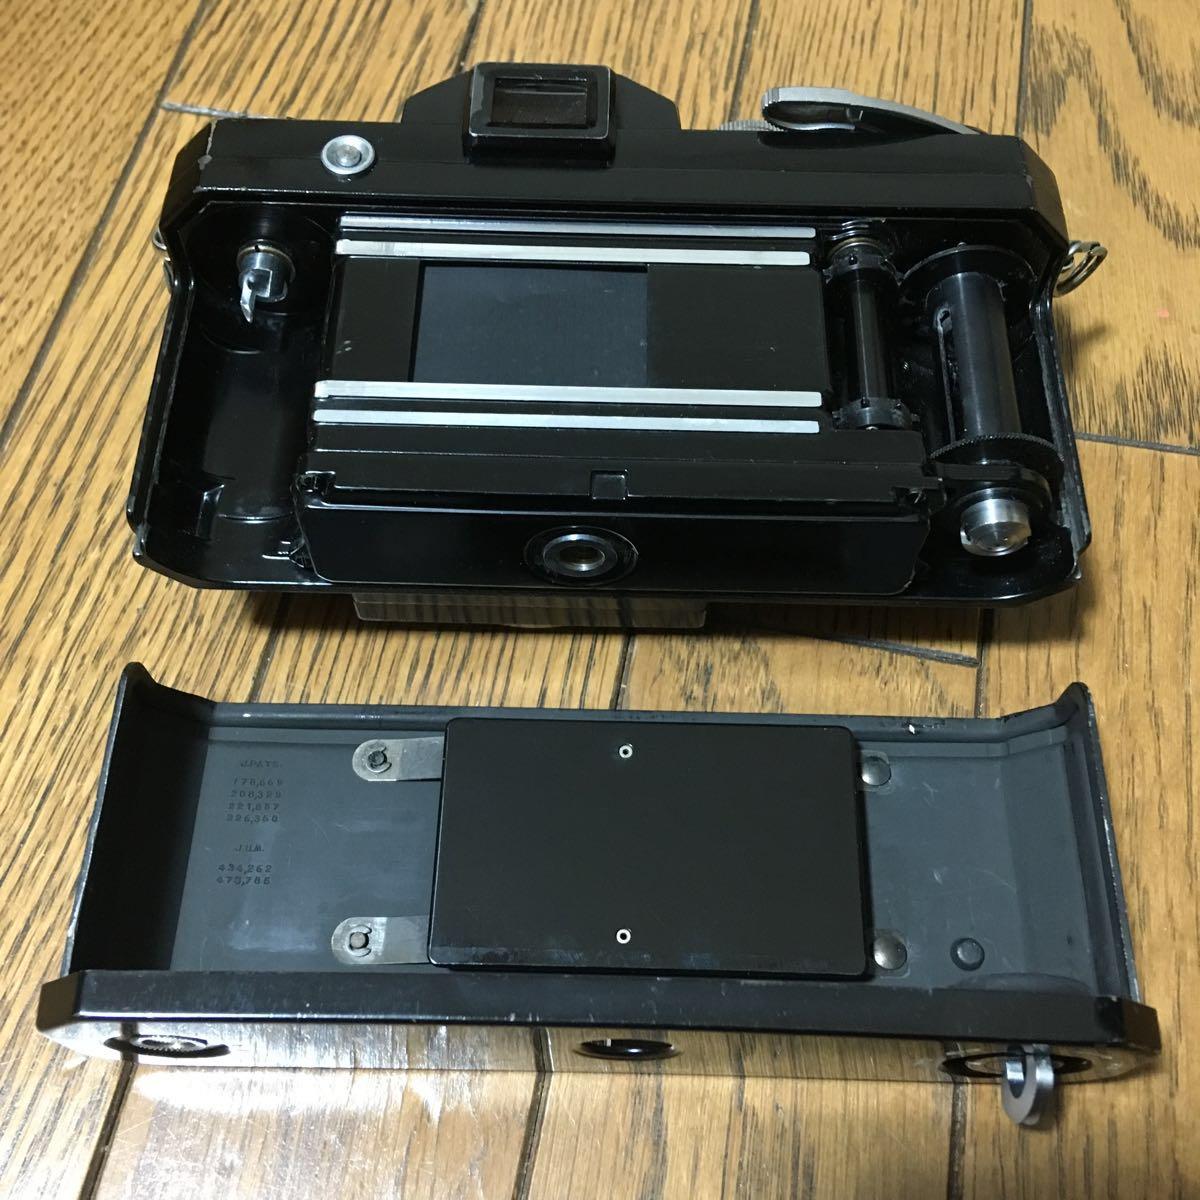 Nikon F アイレベル ブラック ボディ 646万台 前期型 動作確認済みです。_画像7